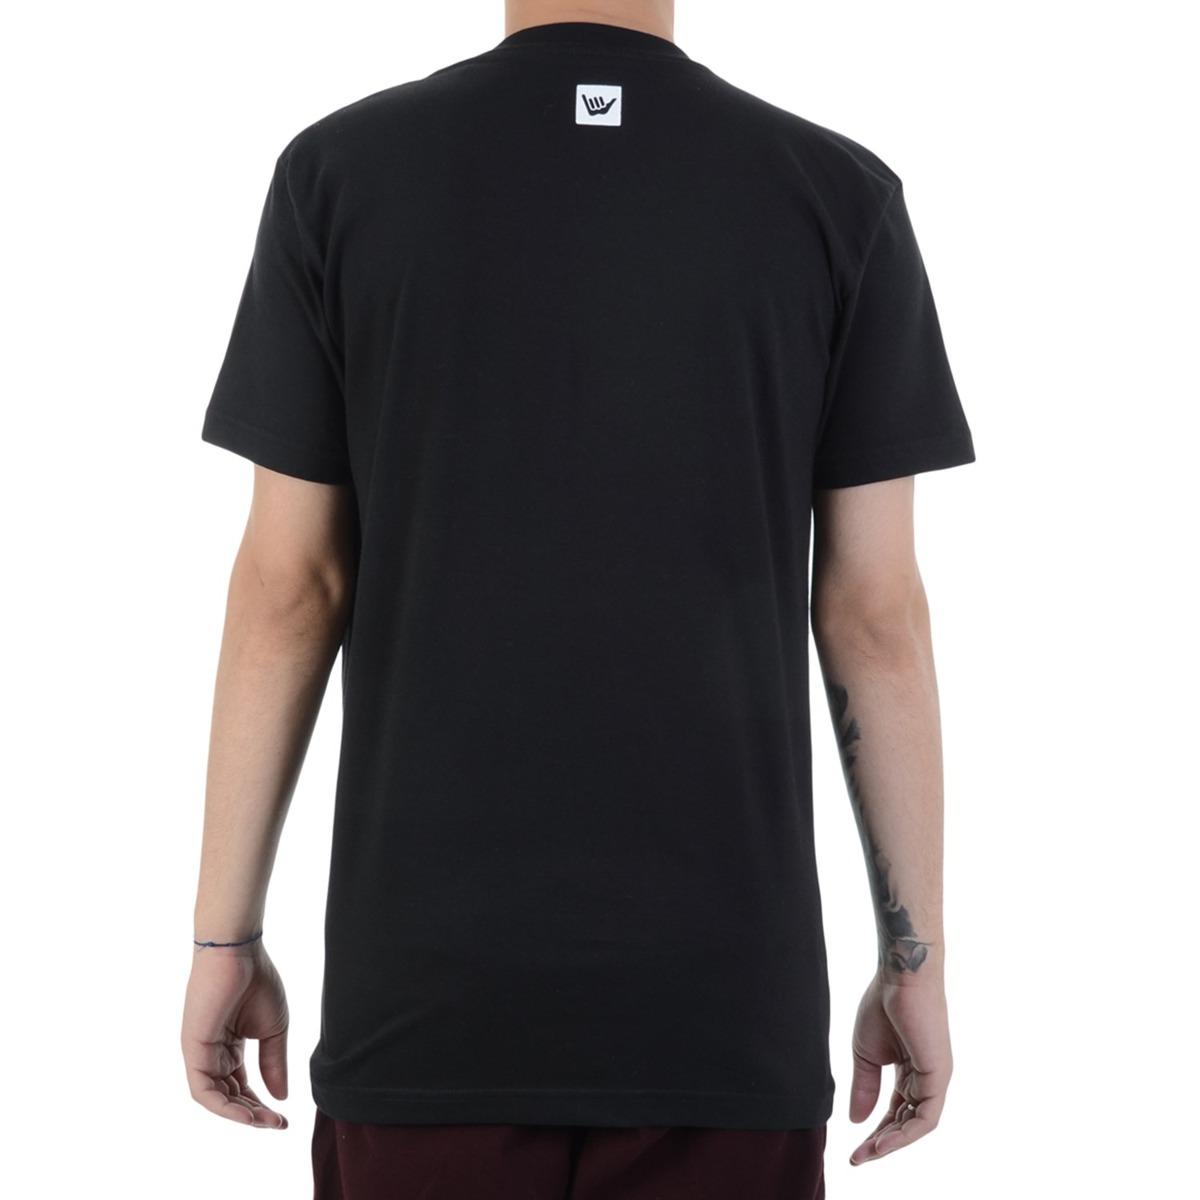 camiseta hang loose shakabow. Carregando zoom. 60e2601f374b3